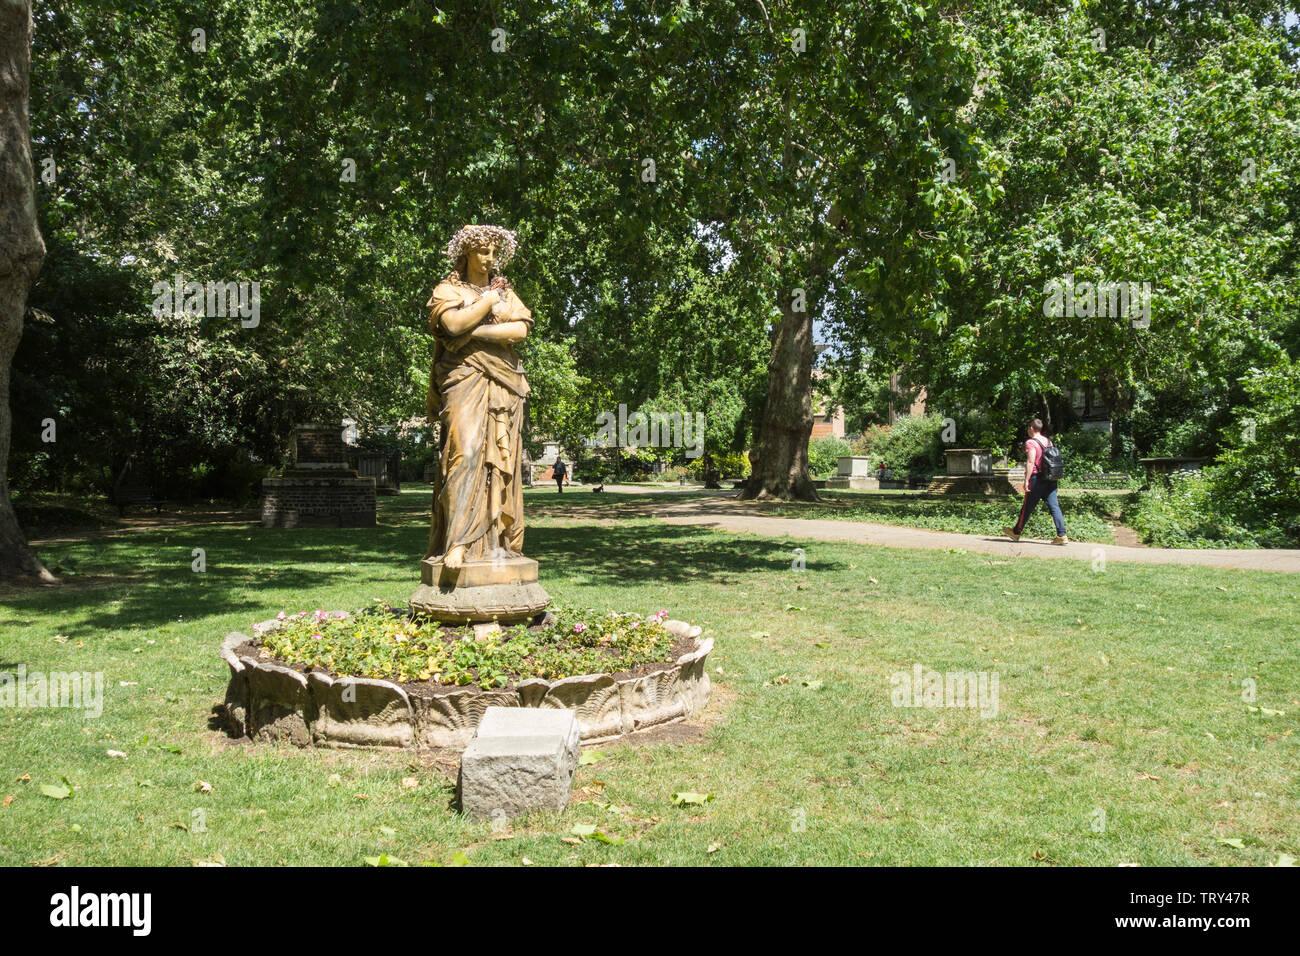 Terracotta statue of Euterpe the Muse of instrumental music, in St George's Garden's, Camden, London, UK Stock Photo